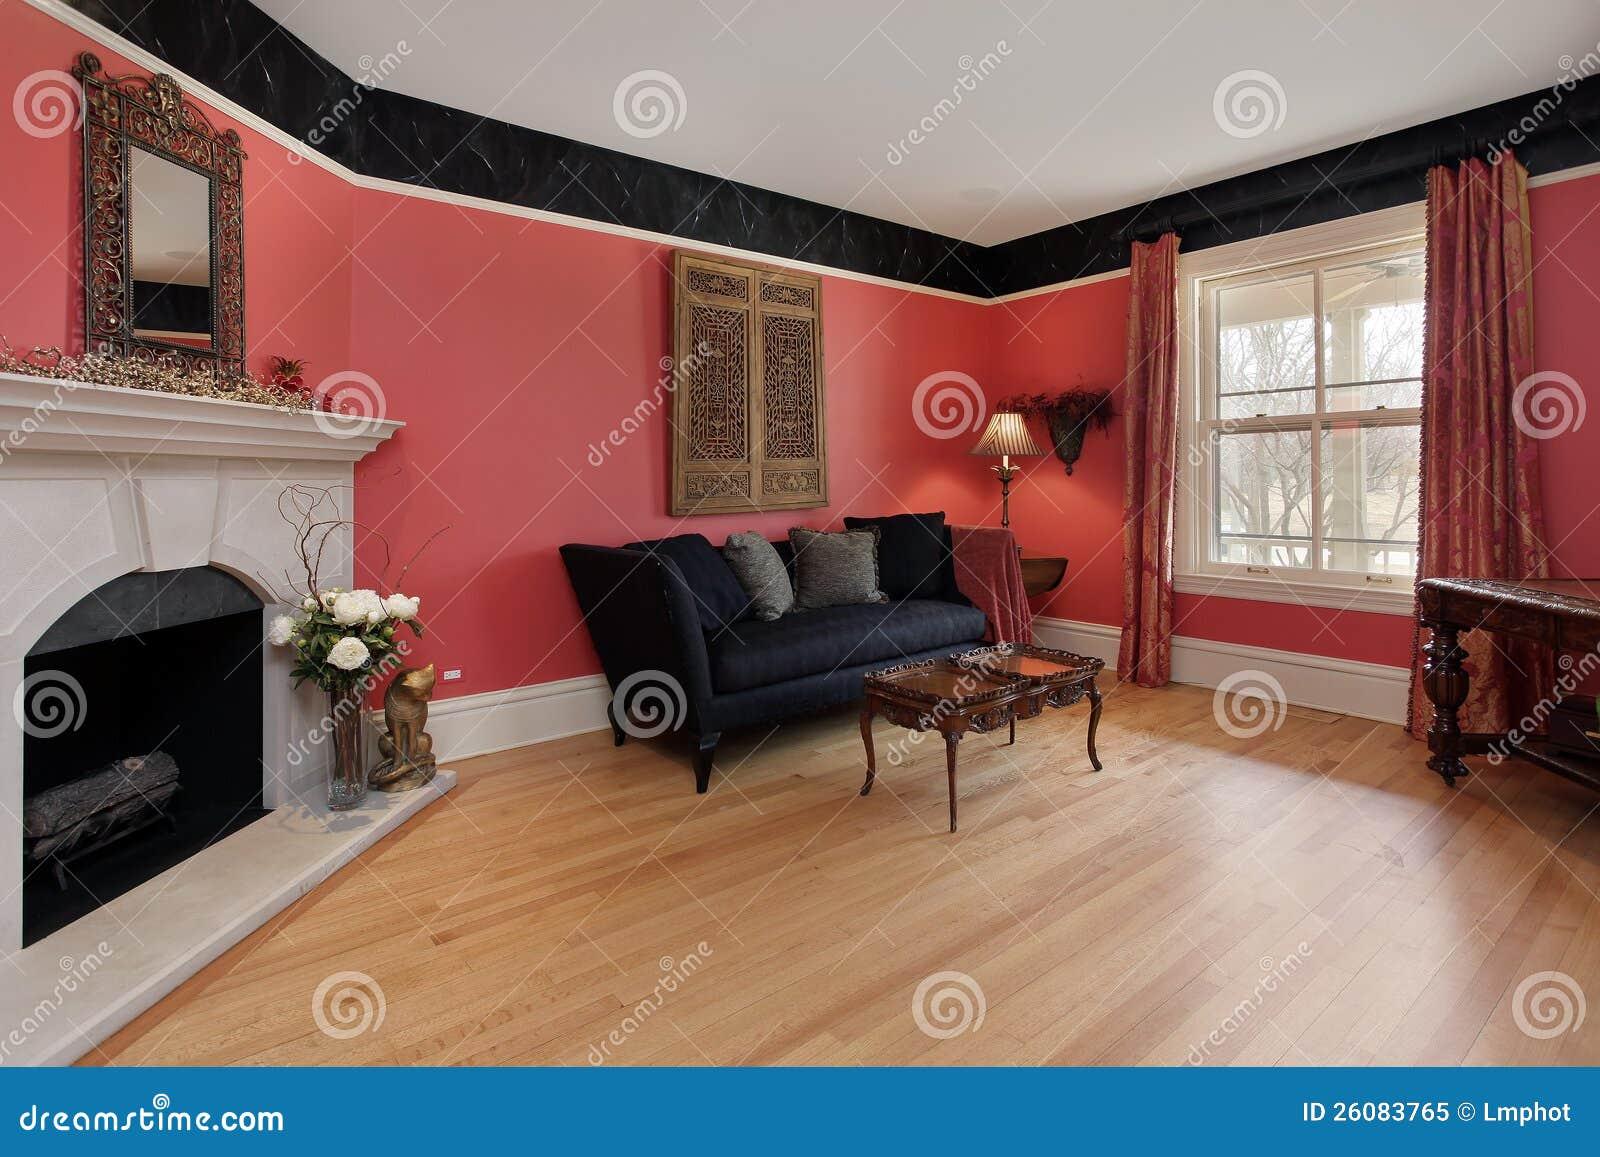 Furniture Vector